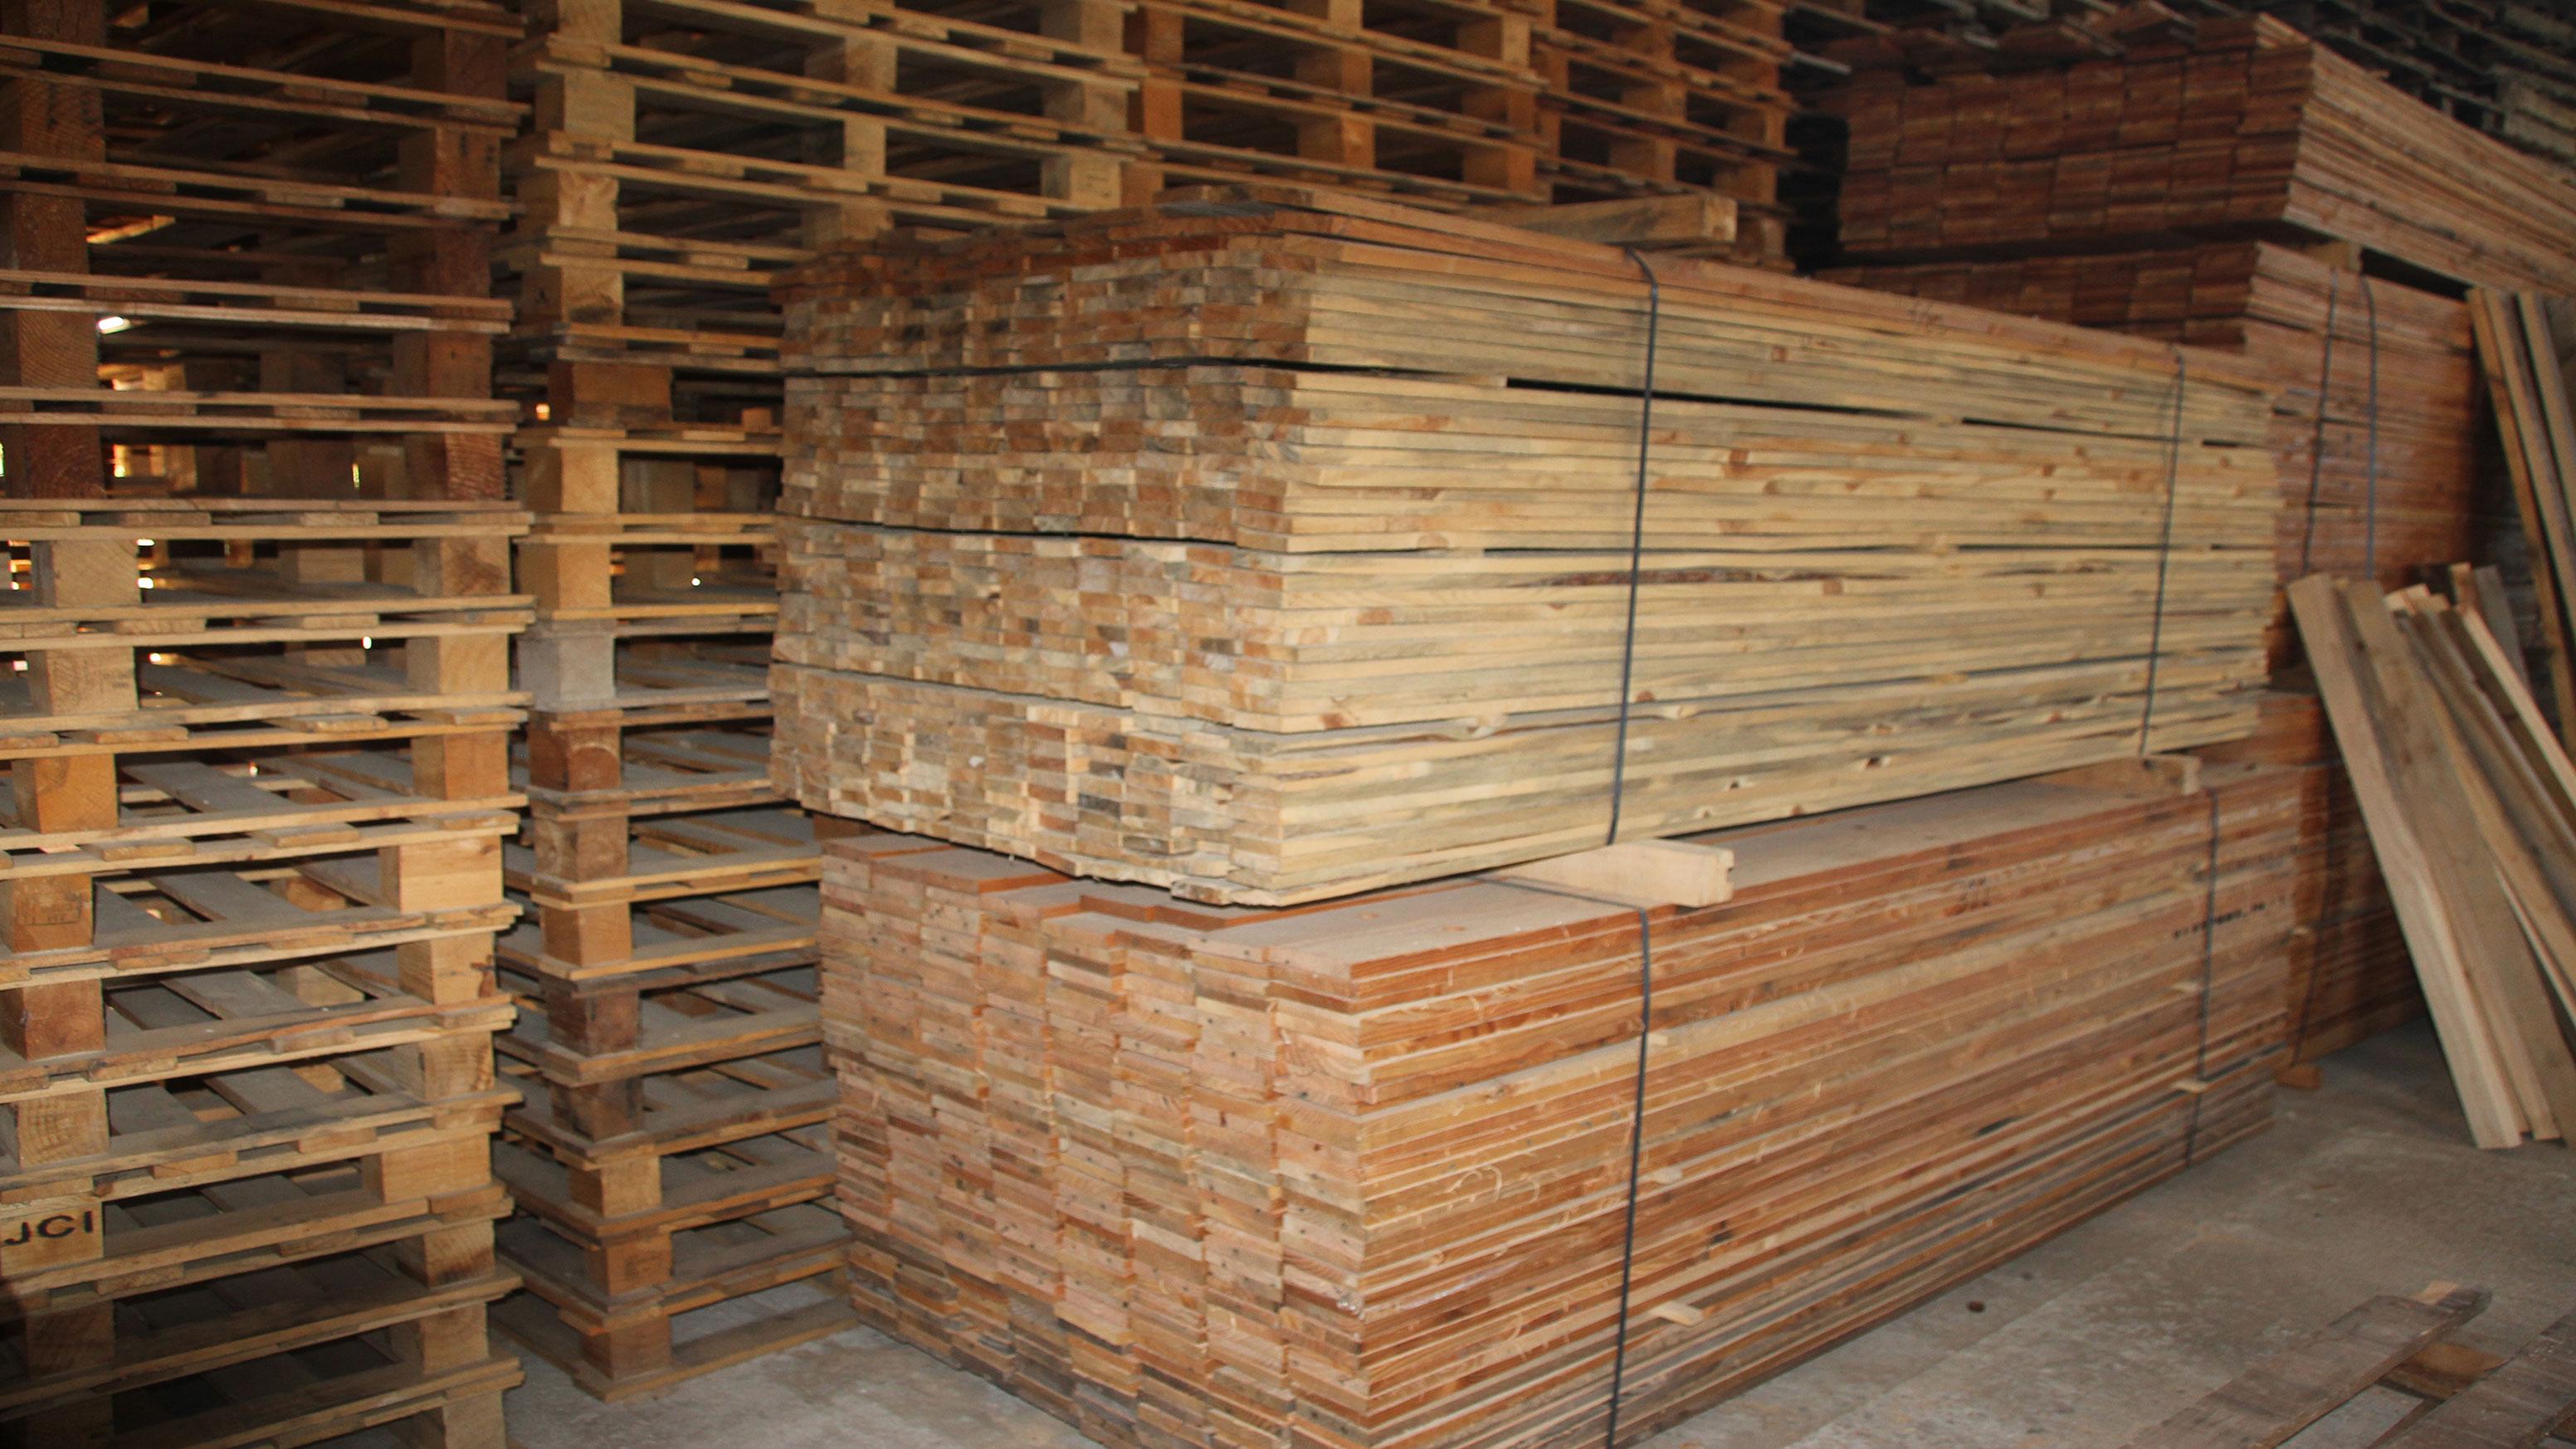 Reciclaje de maderas formas creativas de reciclar palets - Reciclaje de maderas usadas ...